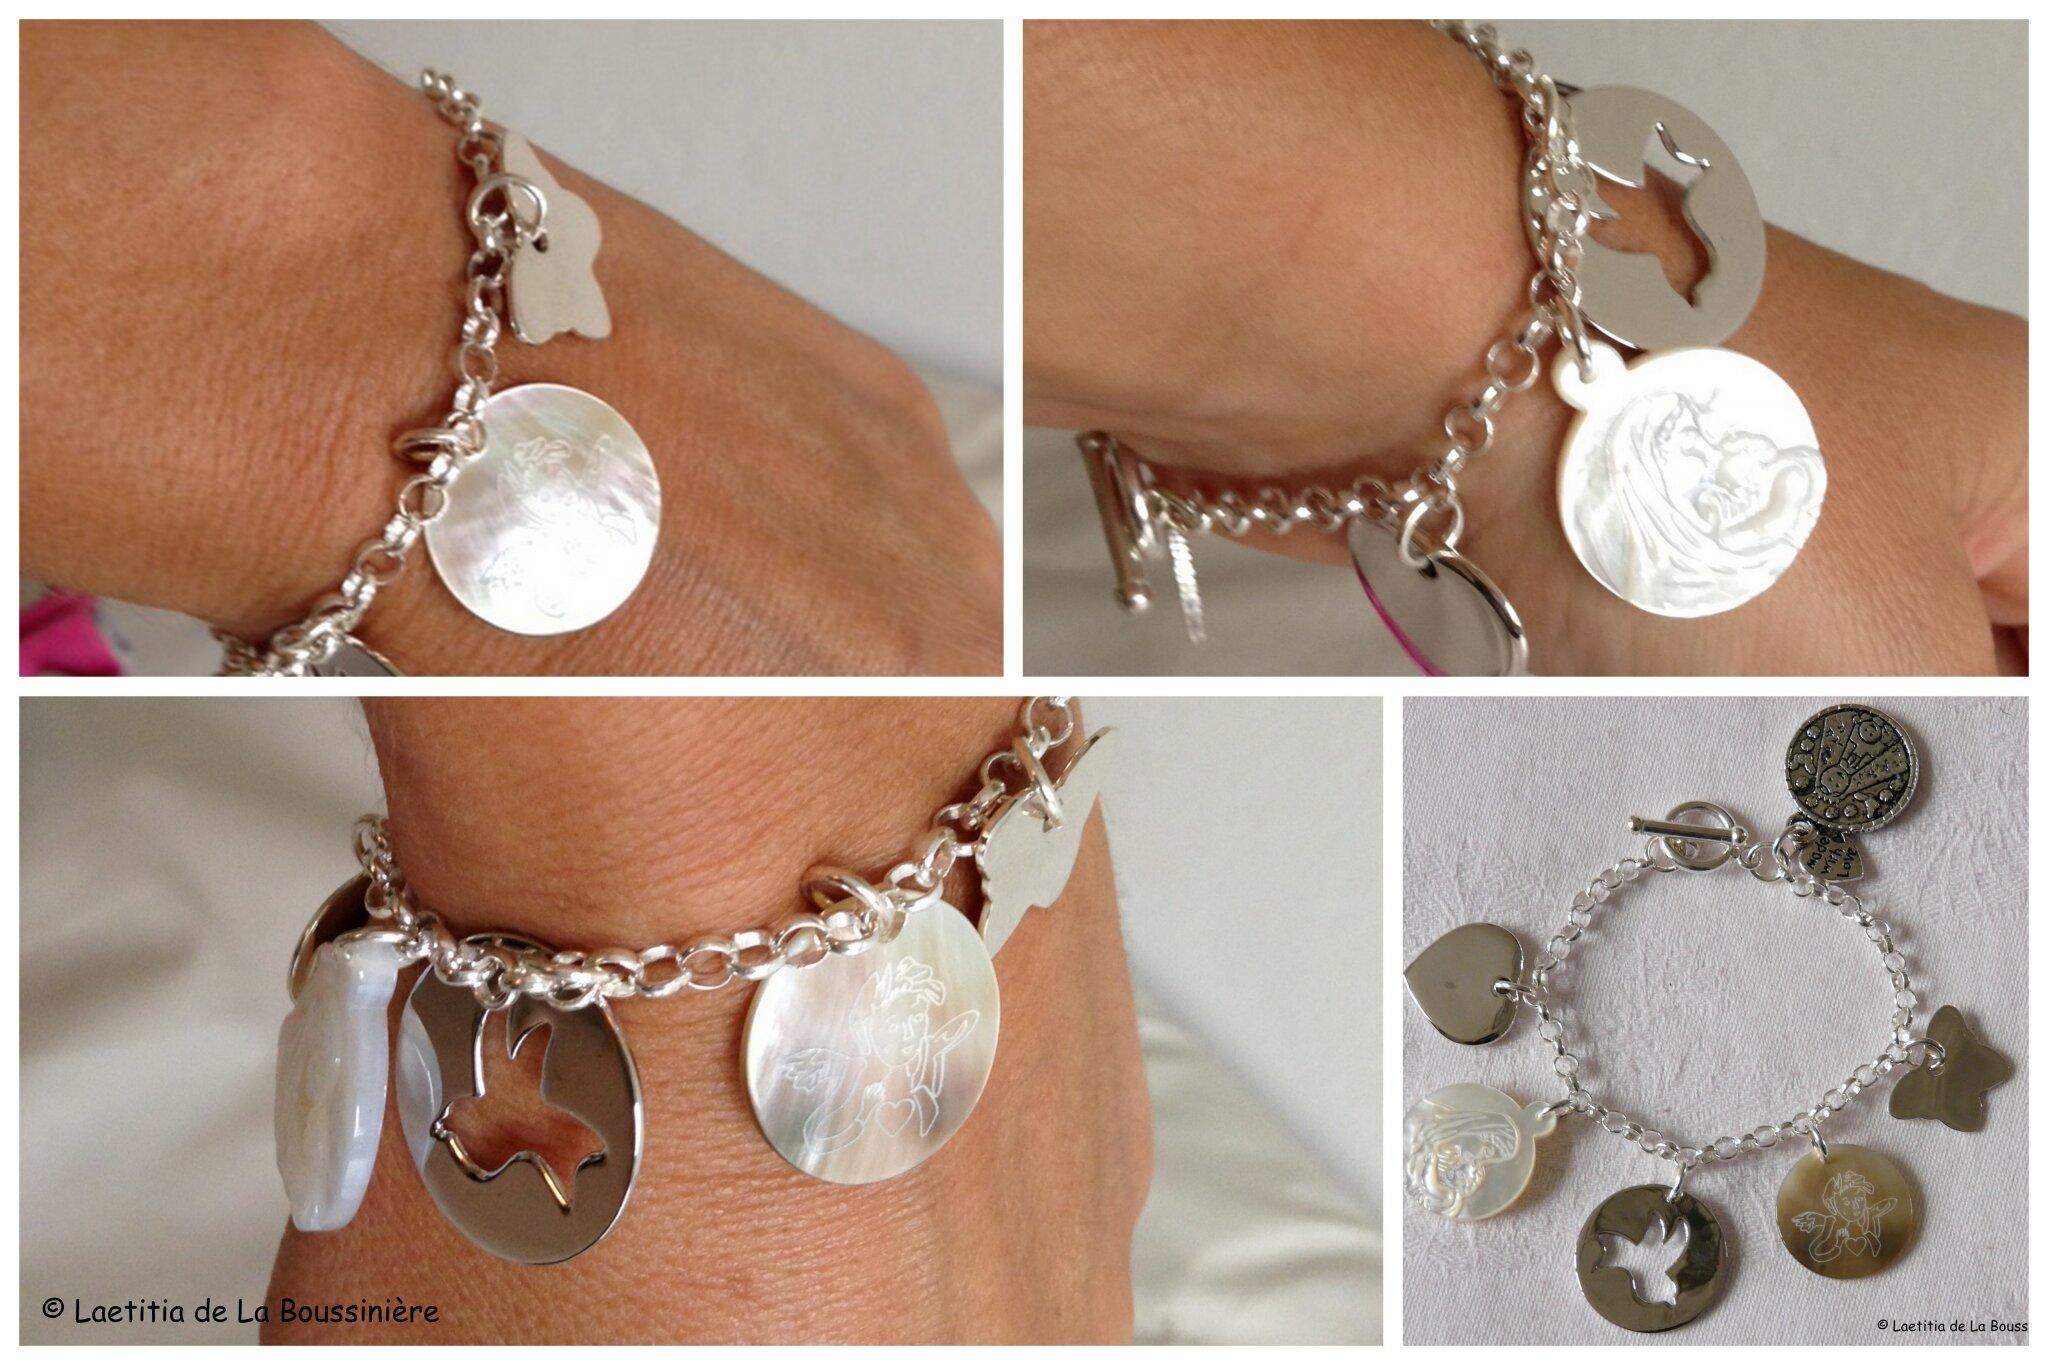 Le bracelet de Viviane